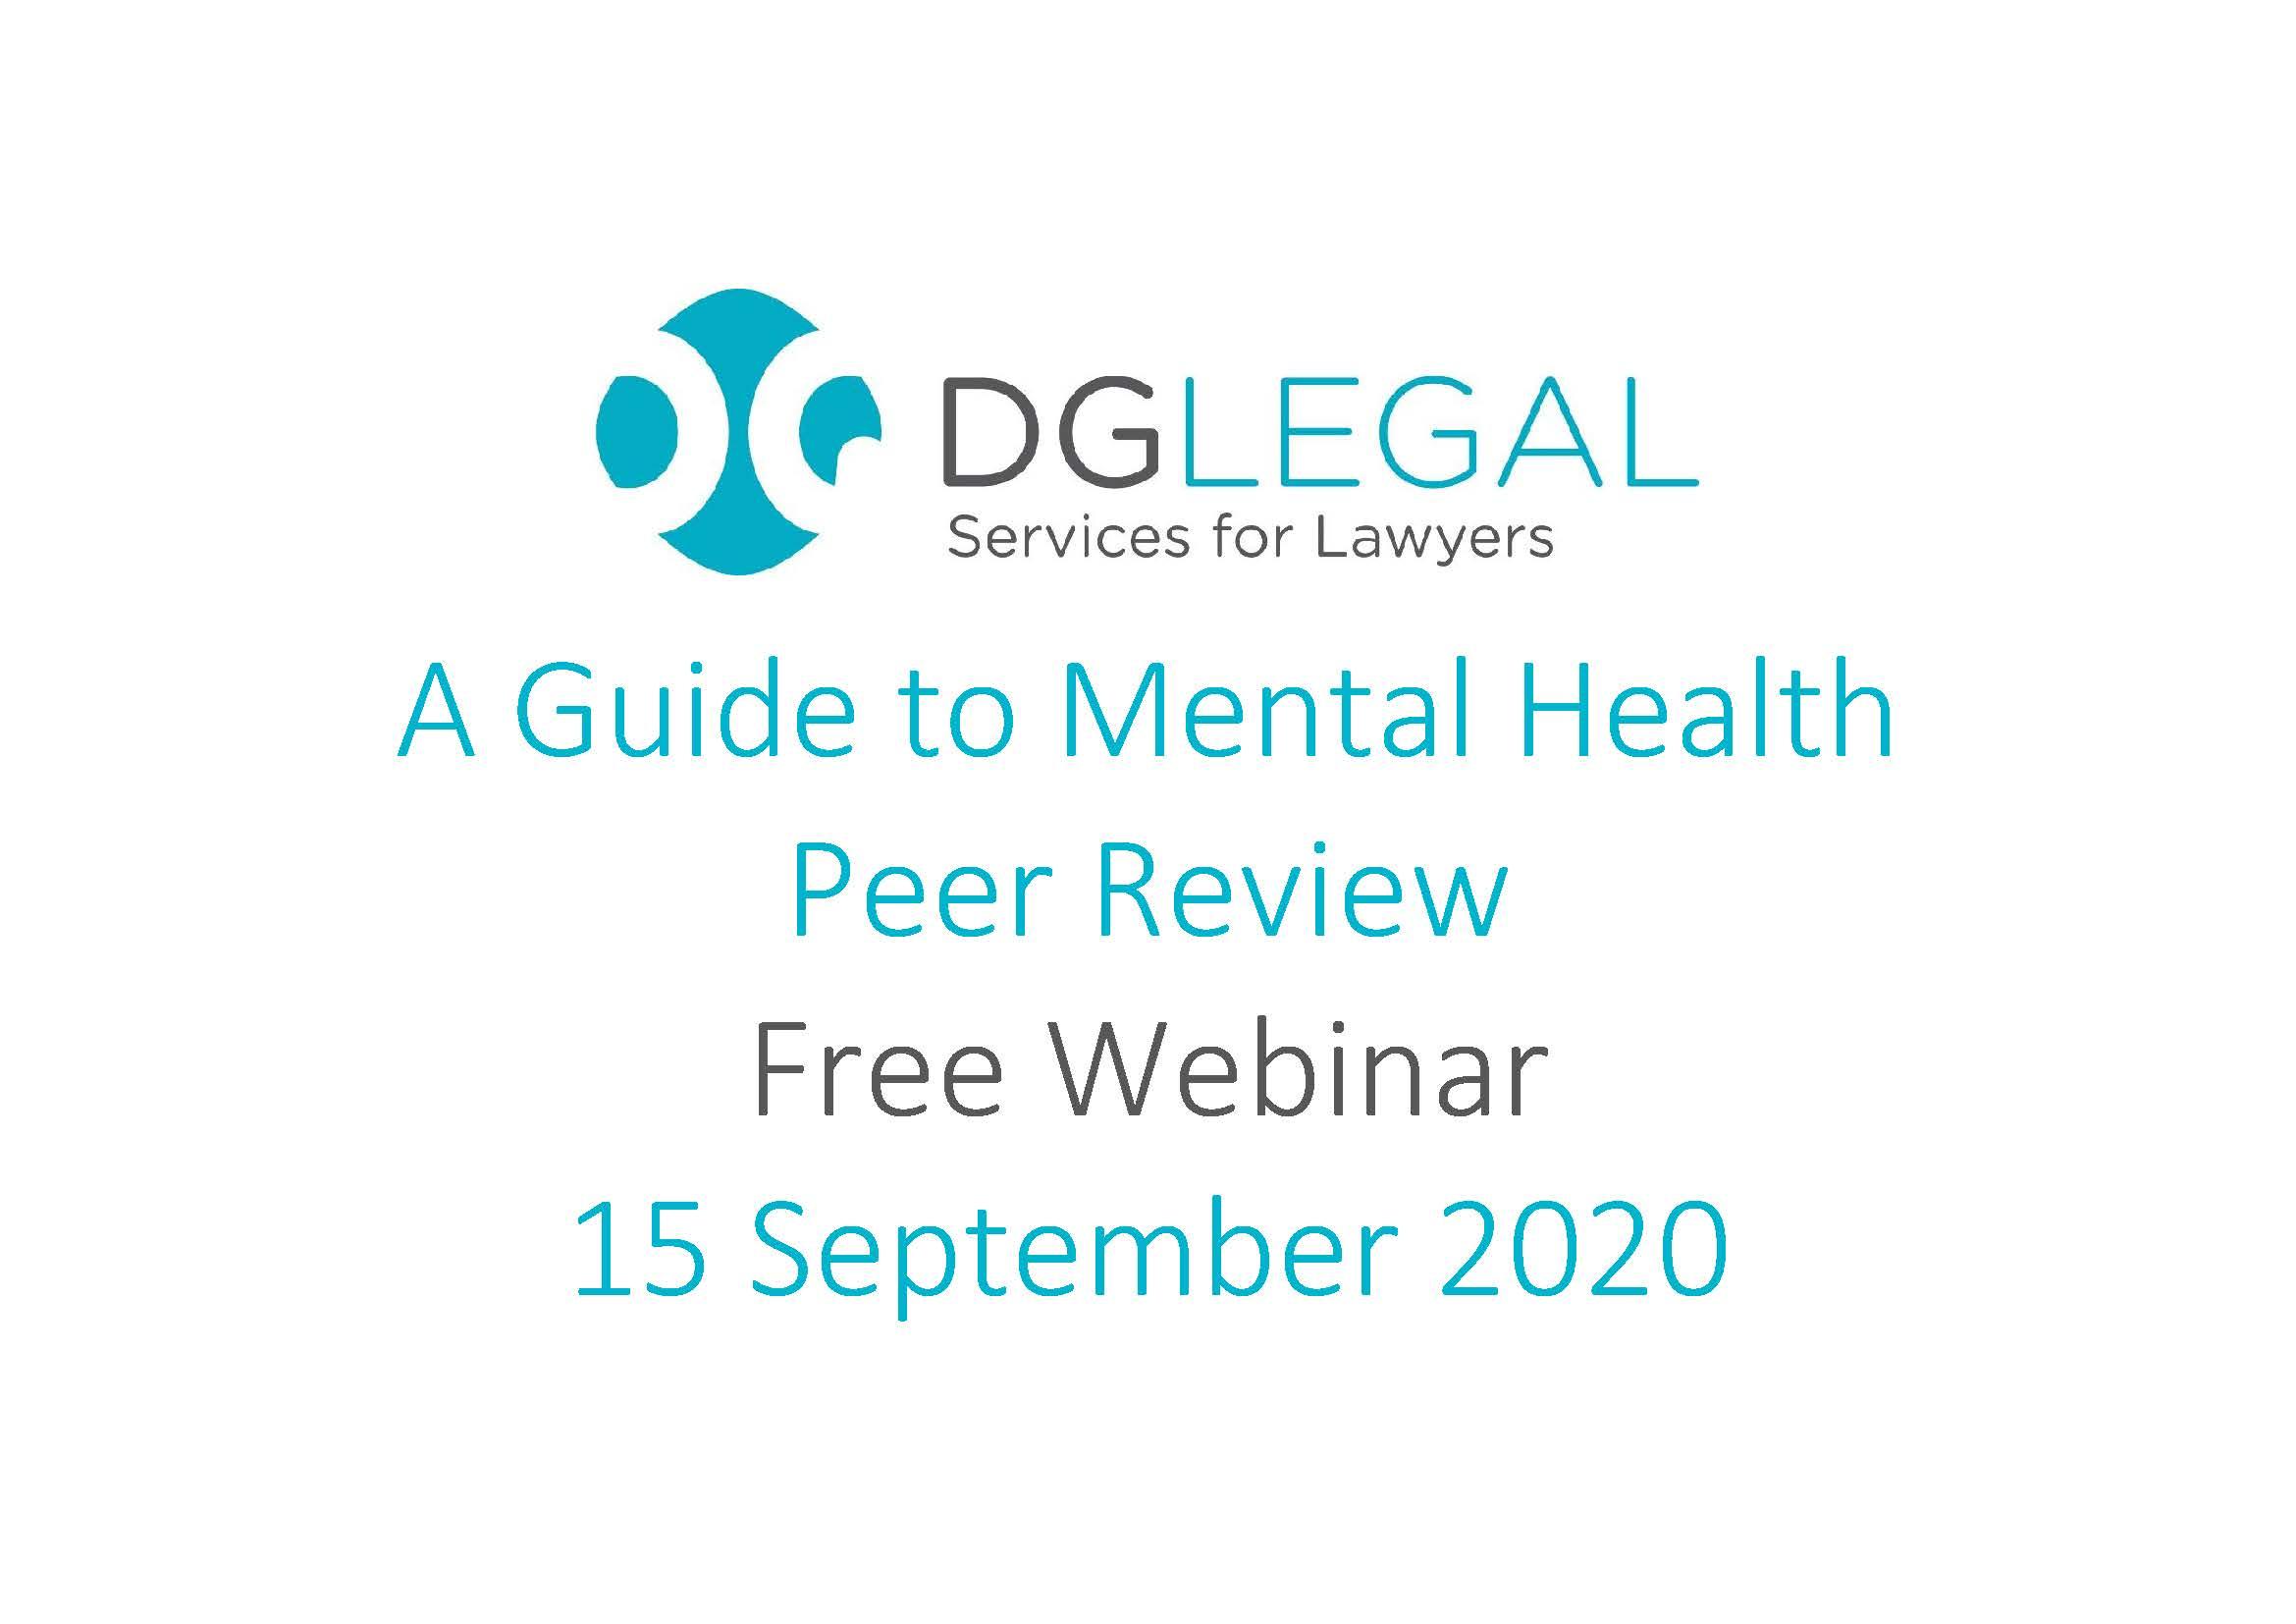 A Guide to Mental Health Peer Review Webinar